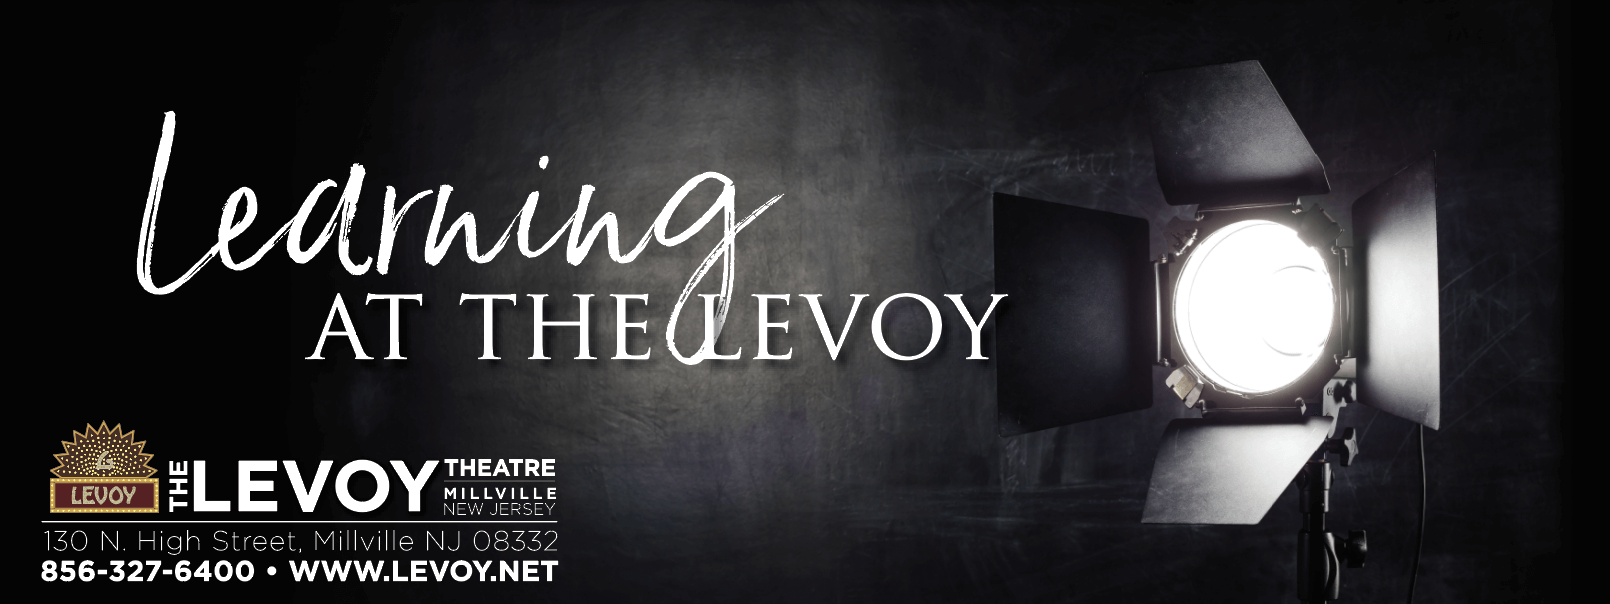 Screen Shot 2019-02-07 at 3 27 11 PM | The Levoy Theatre